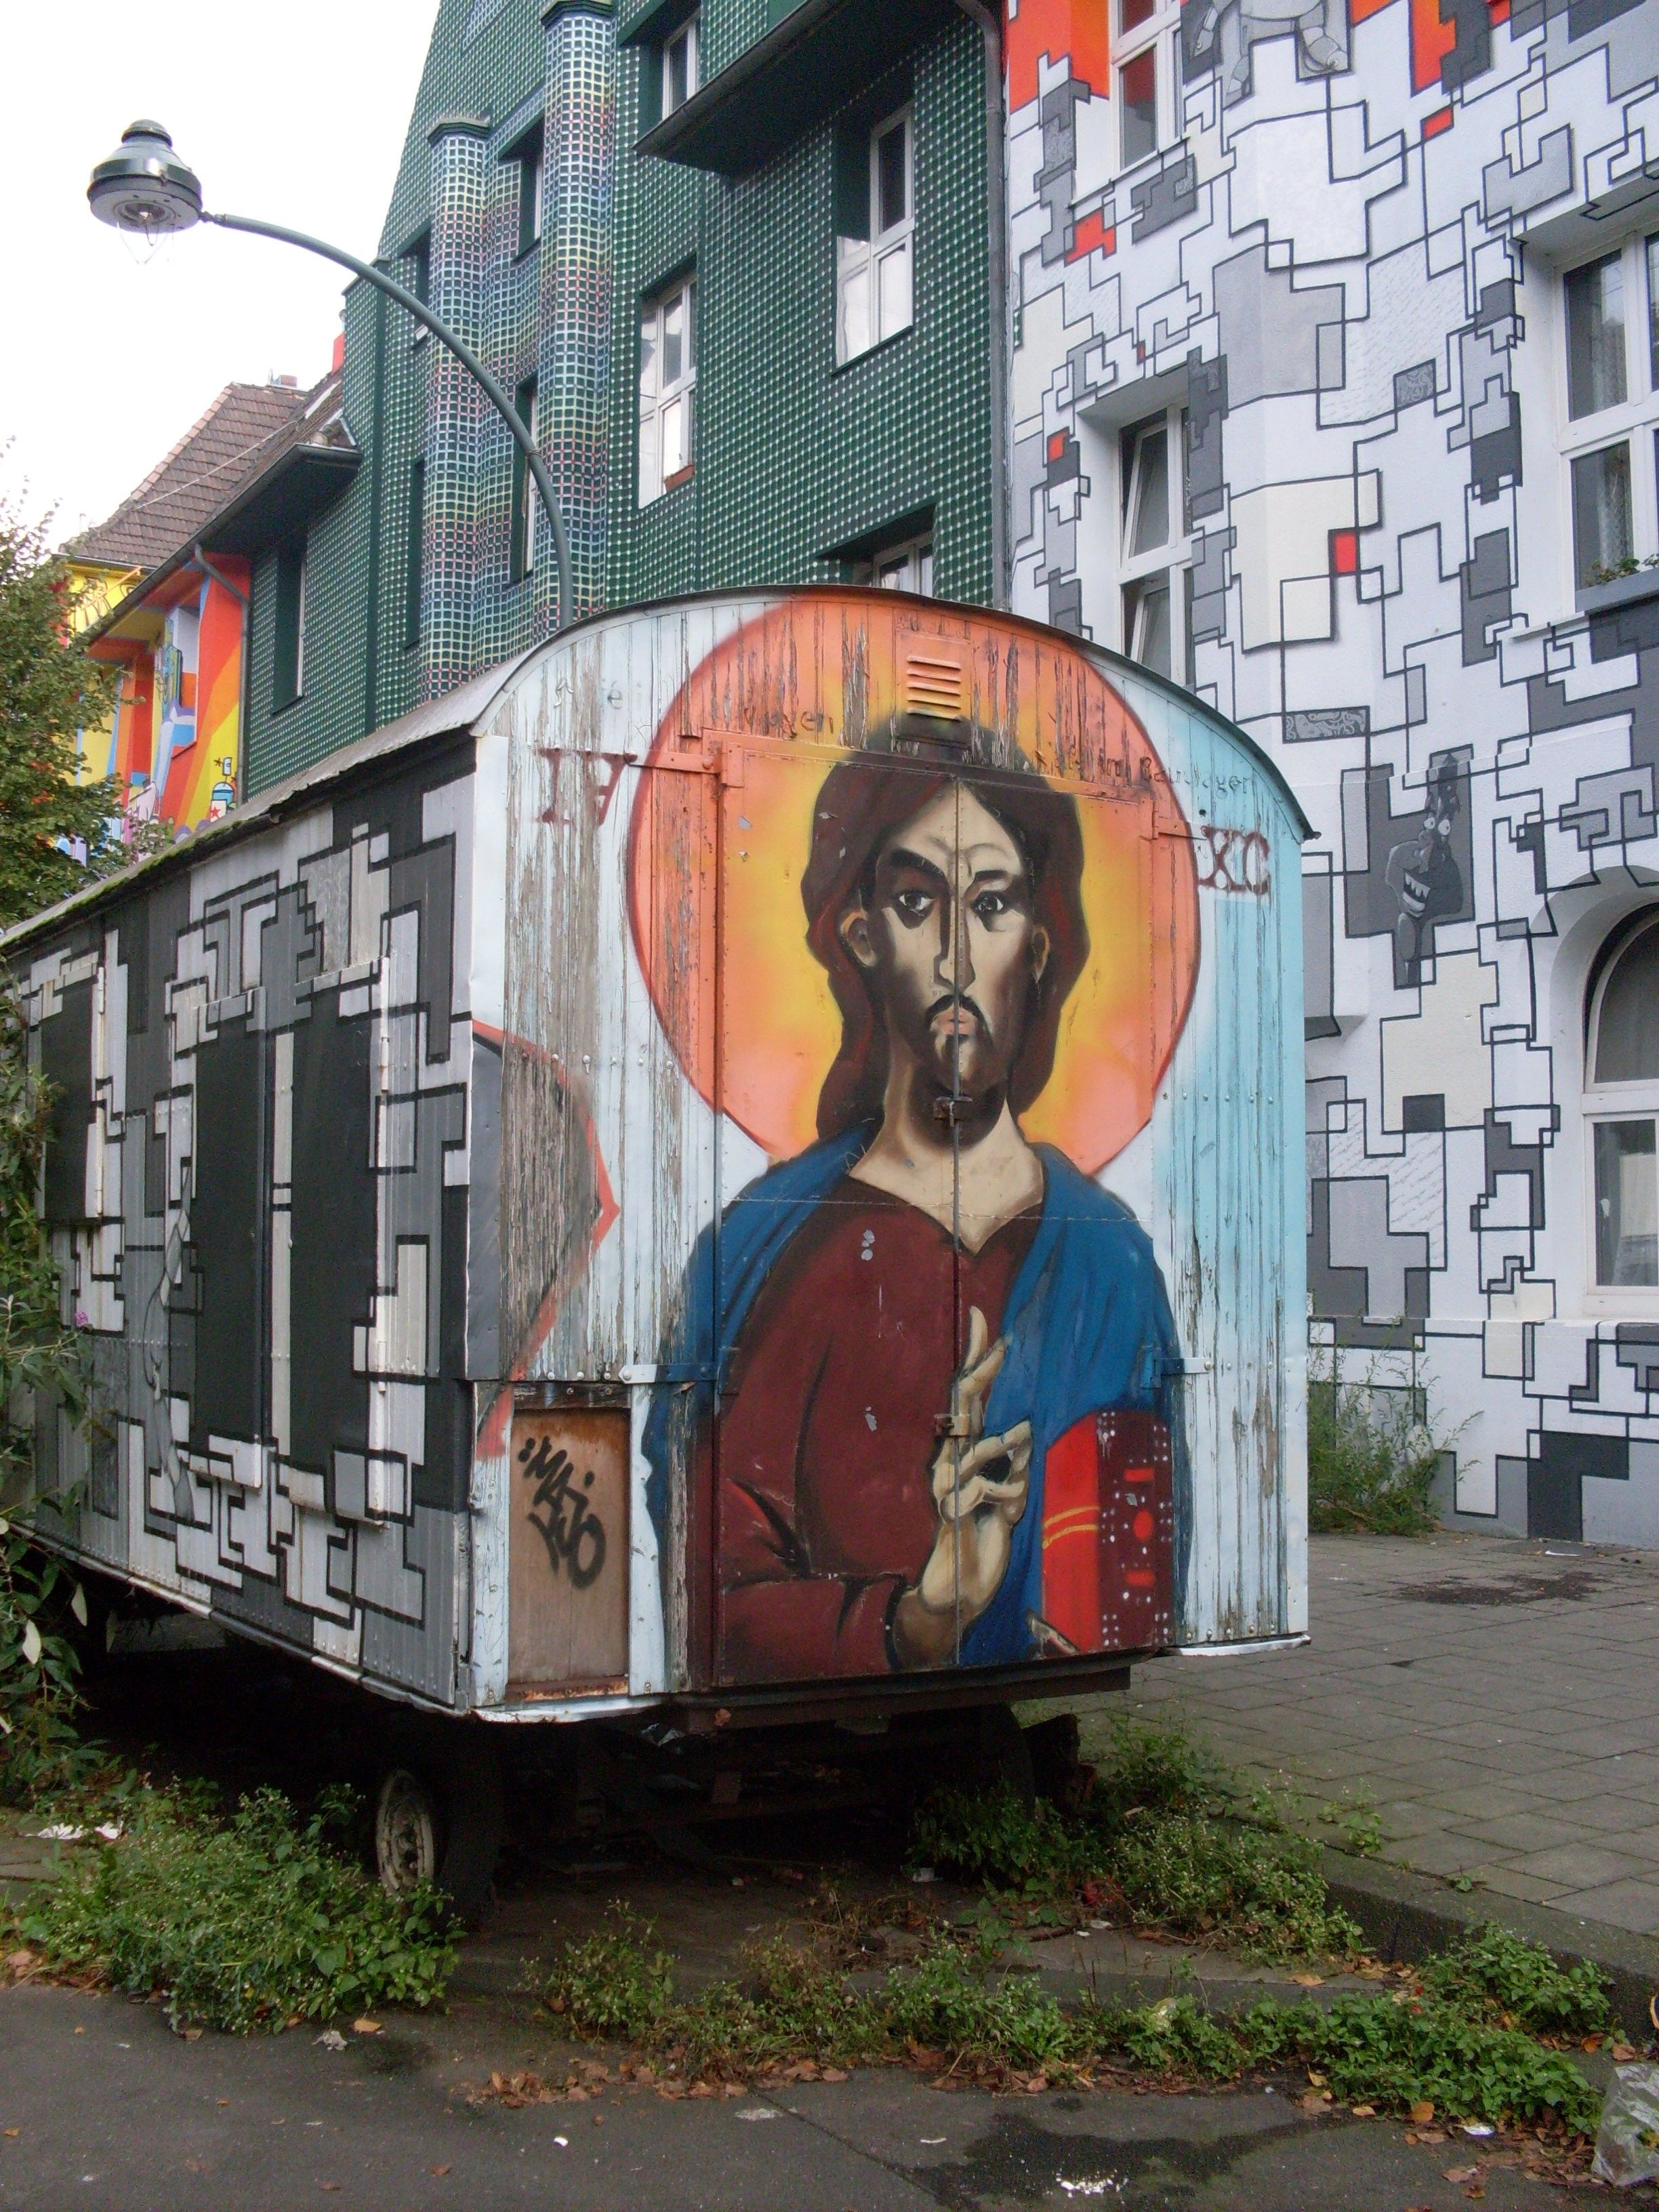 Graffiti Düsseldorf kiefernstr in düsseldorf germany